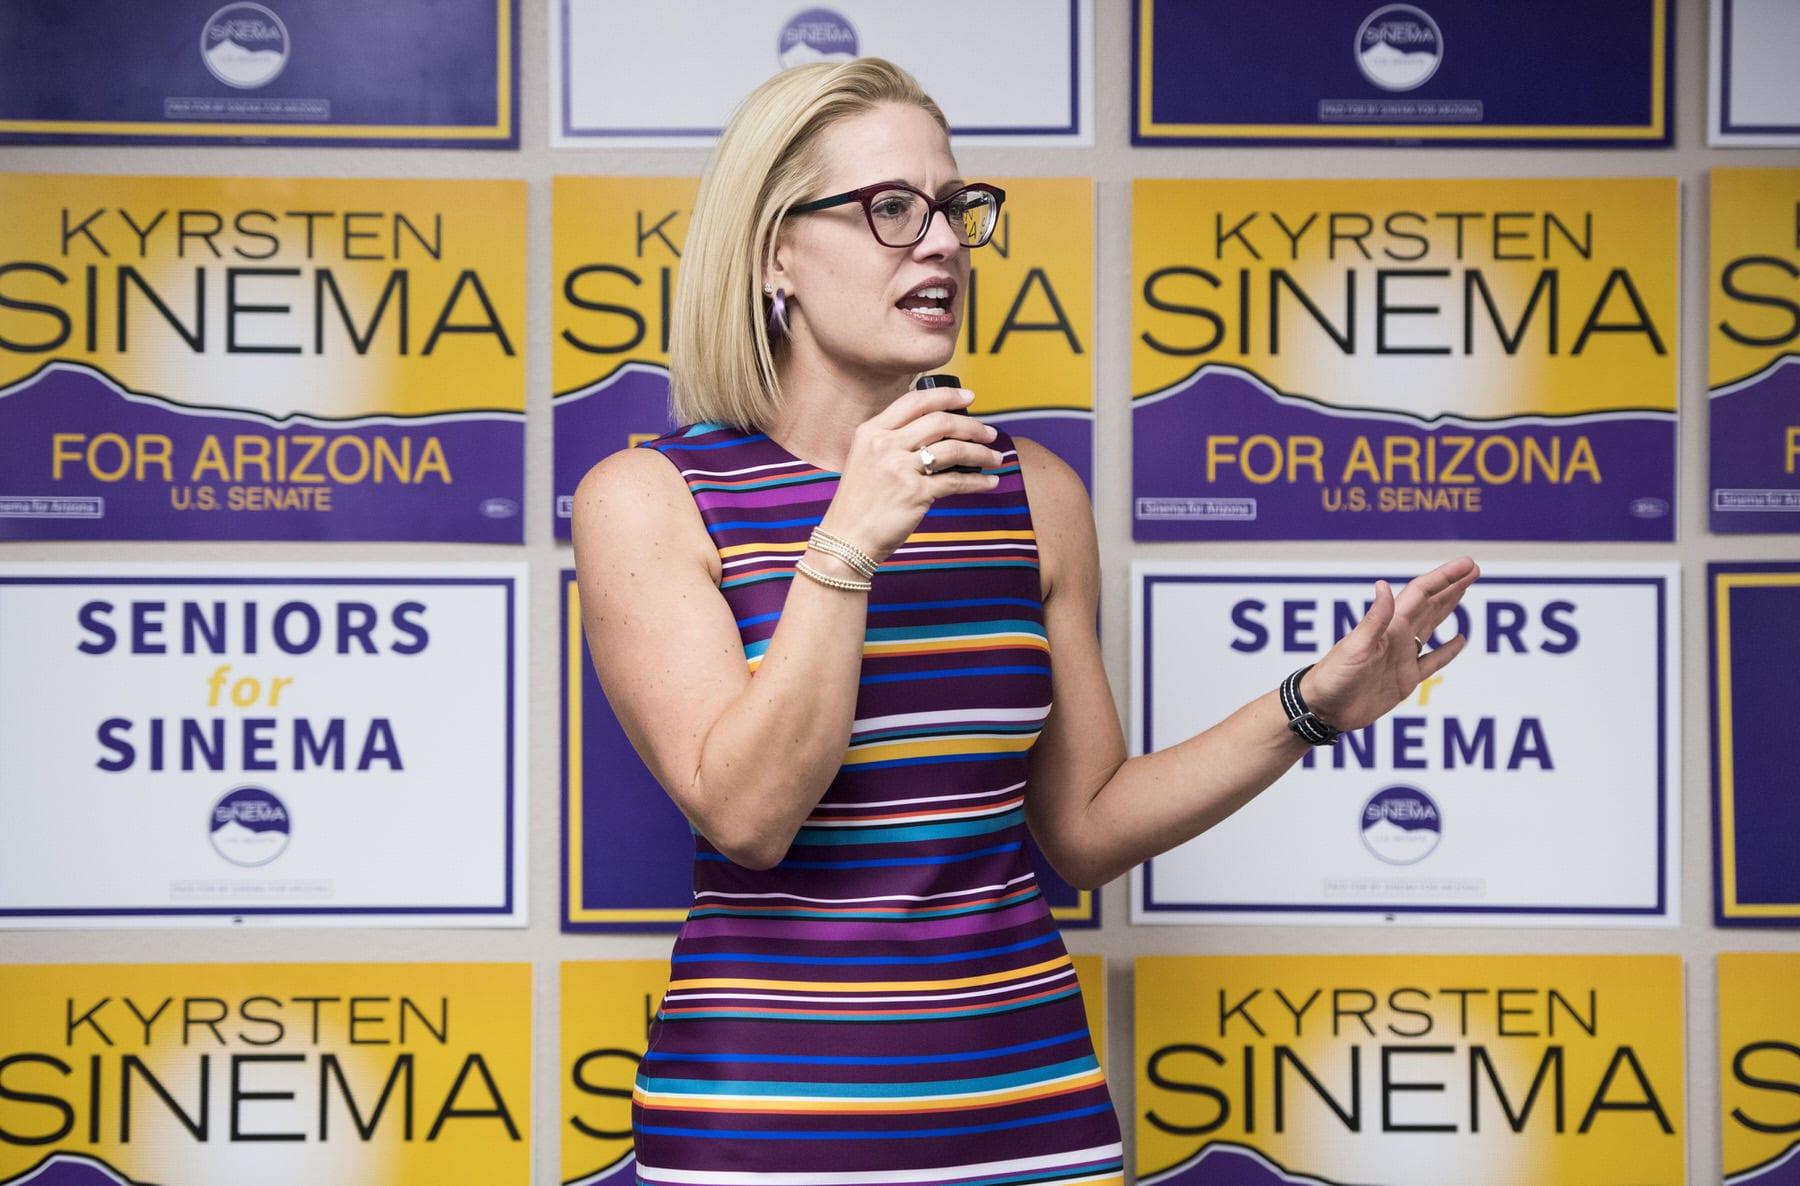 Democratic candidate for U.S. Senate Rep. Kyrsten Sinema, D-Ariz., speaks to supporters.